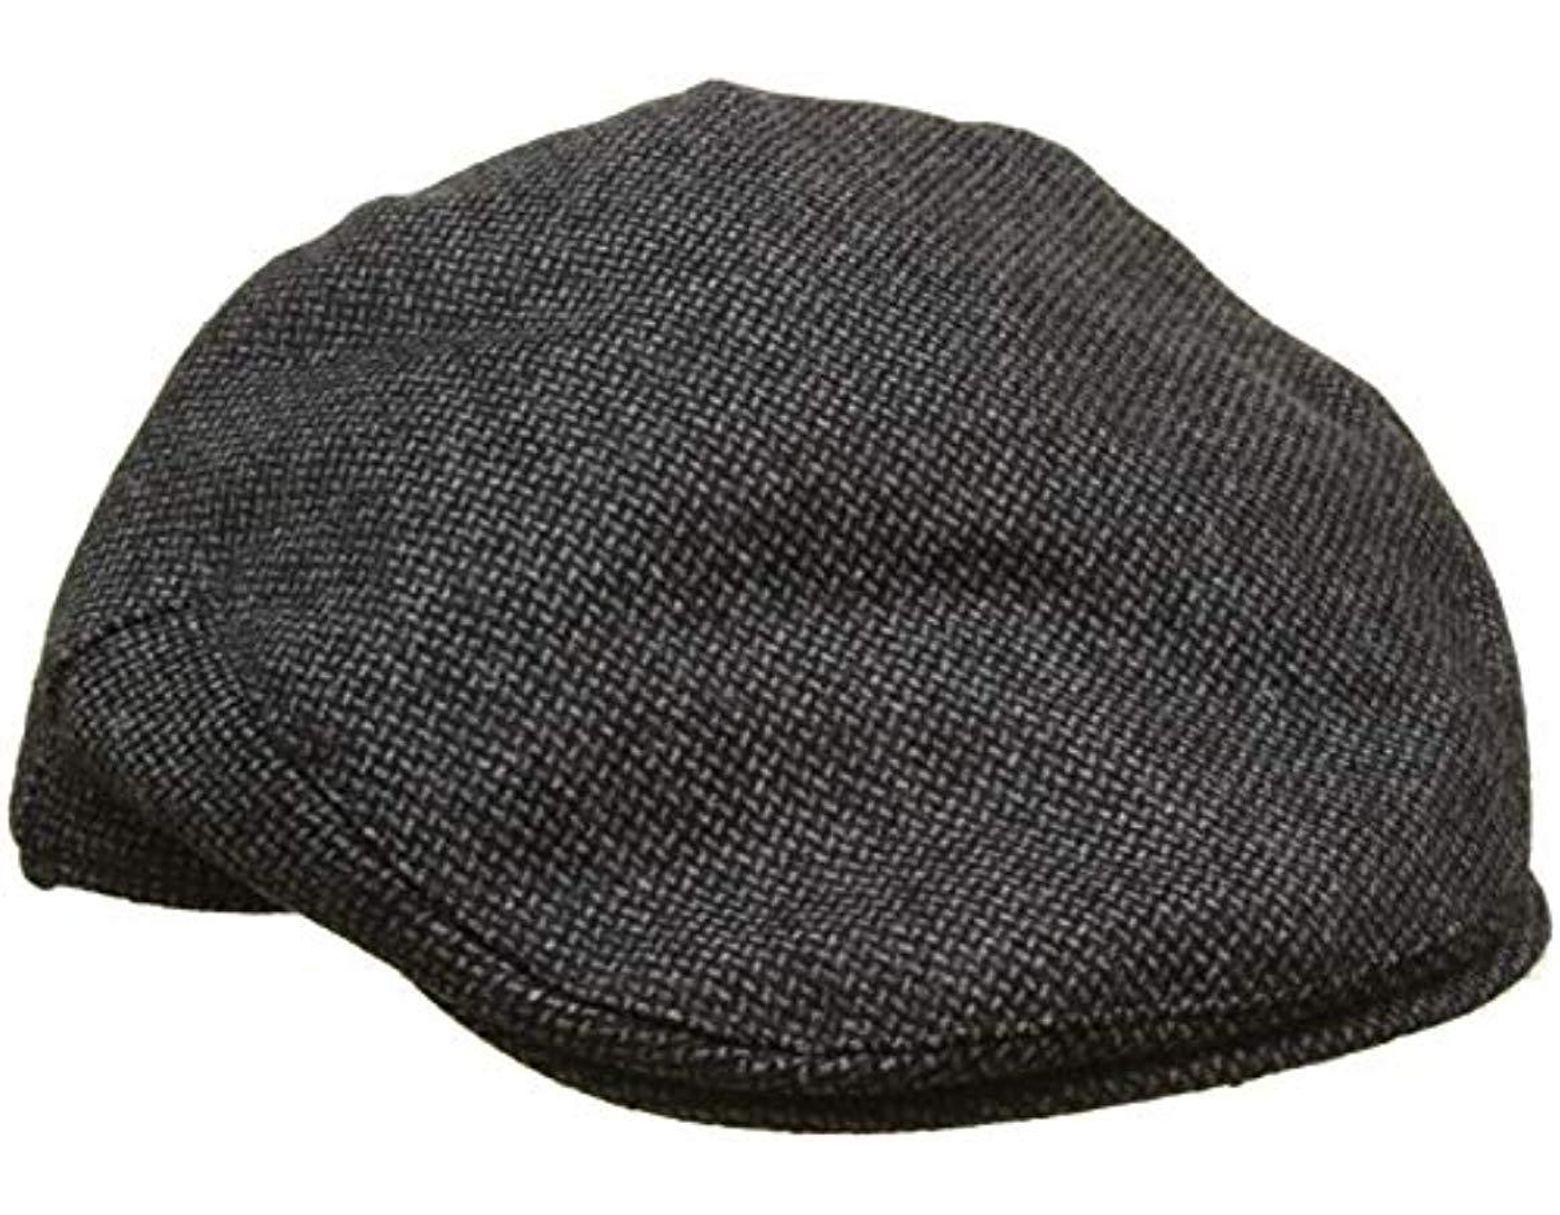 e5c74c8065f5f Hackett Balmoral Tweed Her Flat Cap in Gray for Men - Lyst